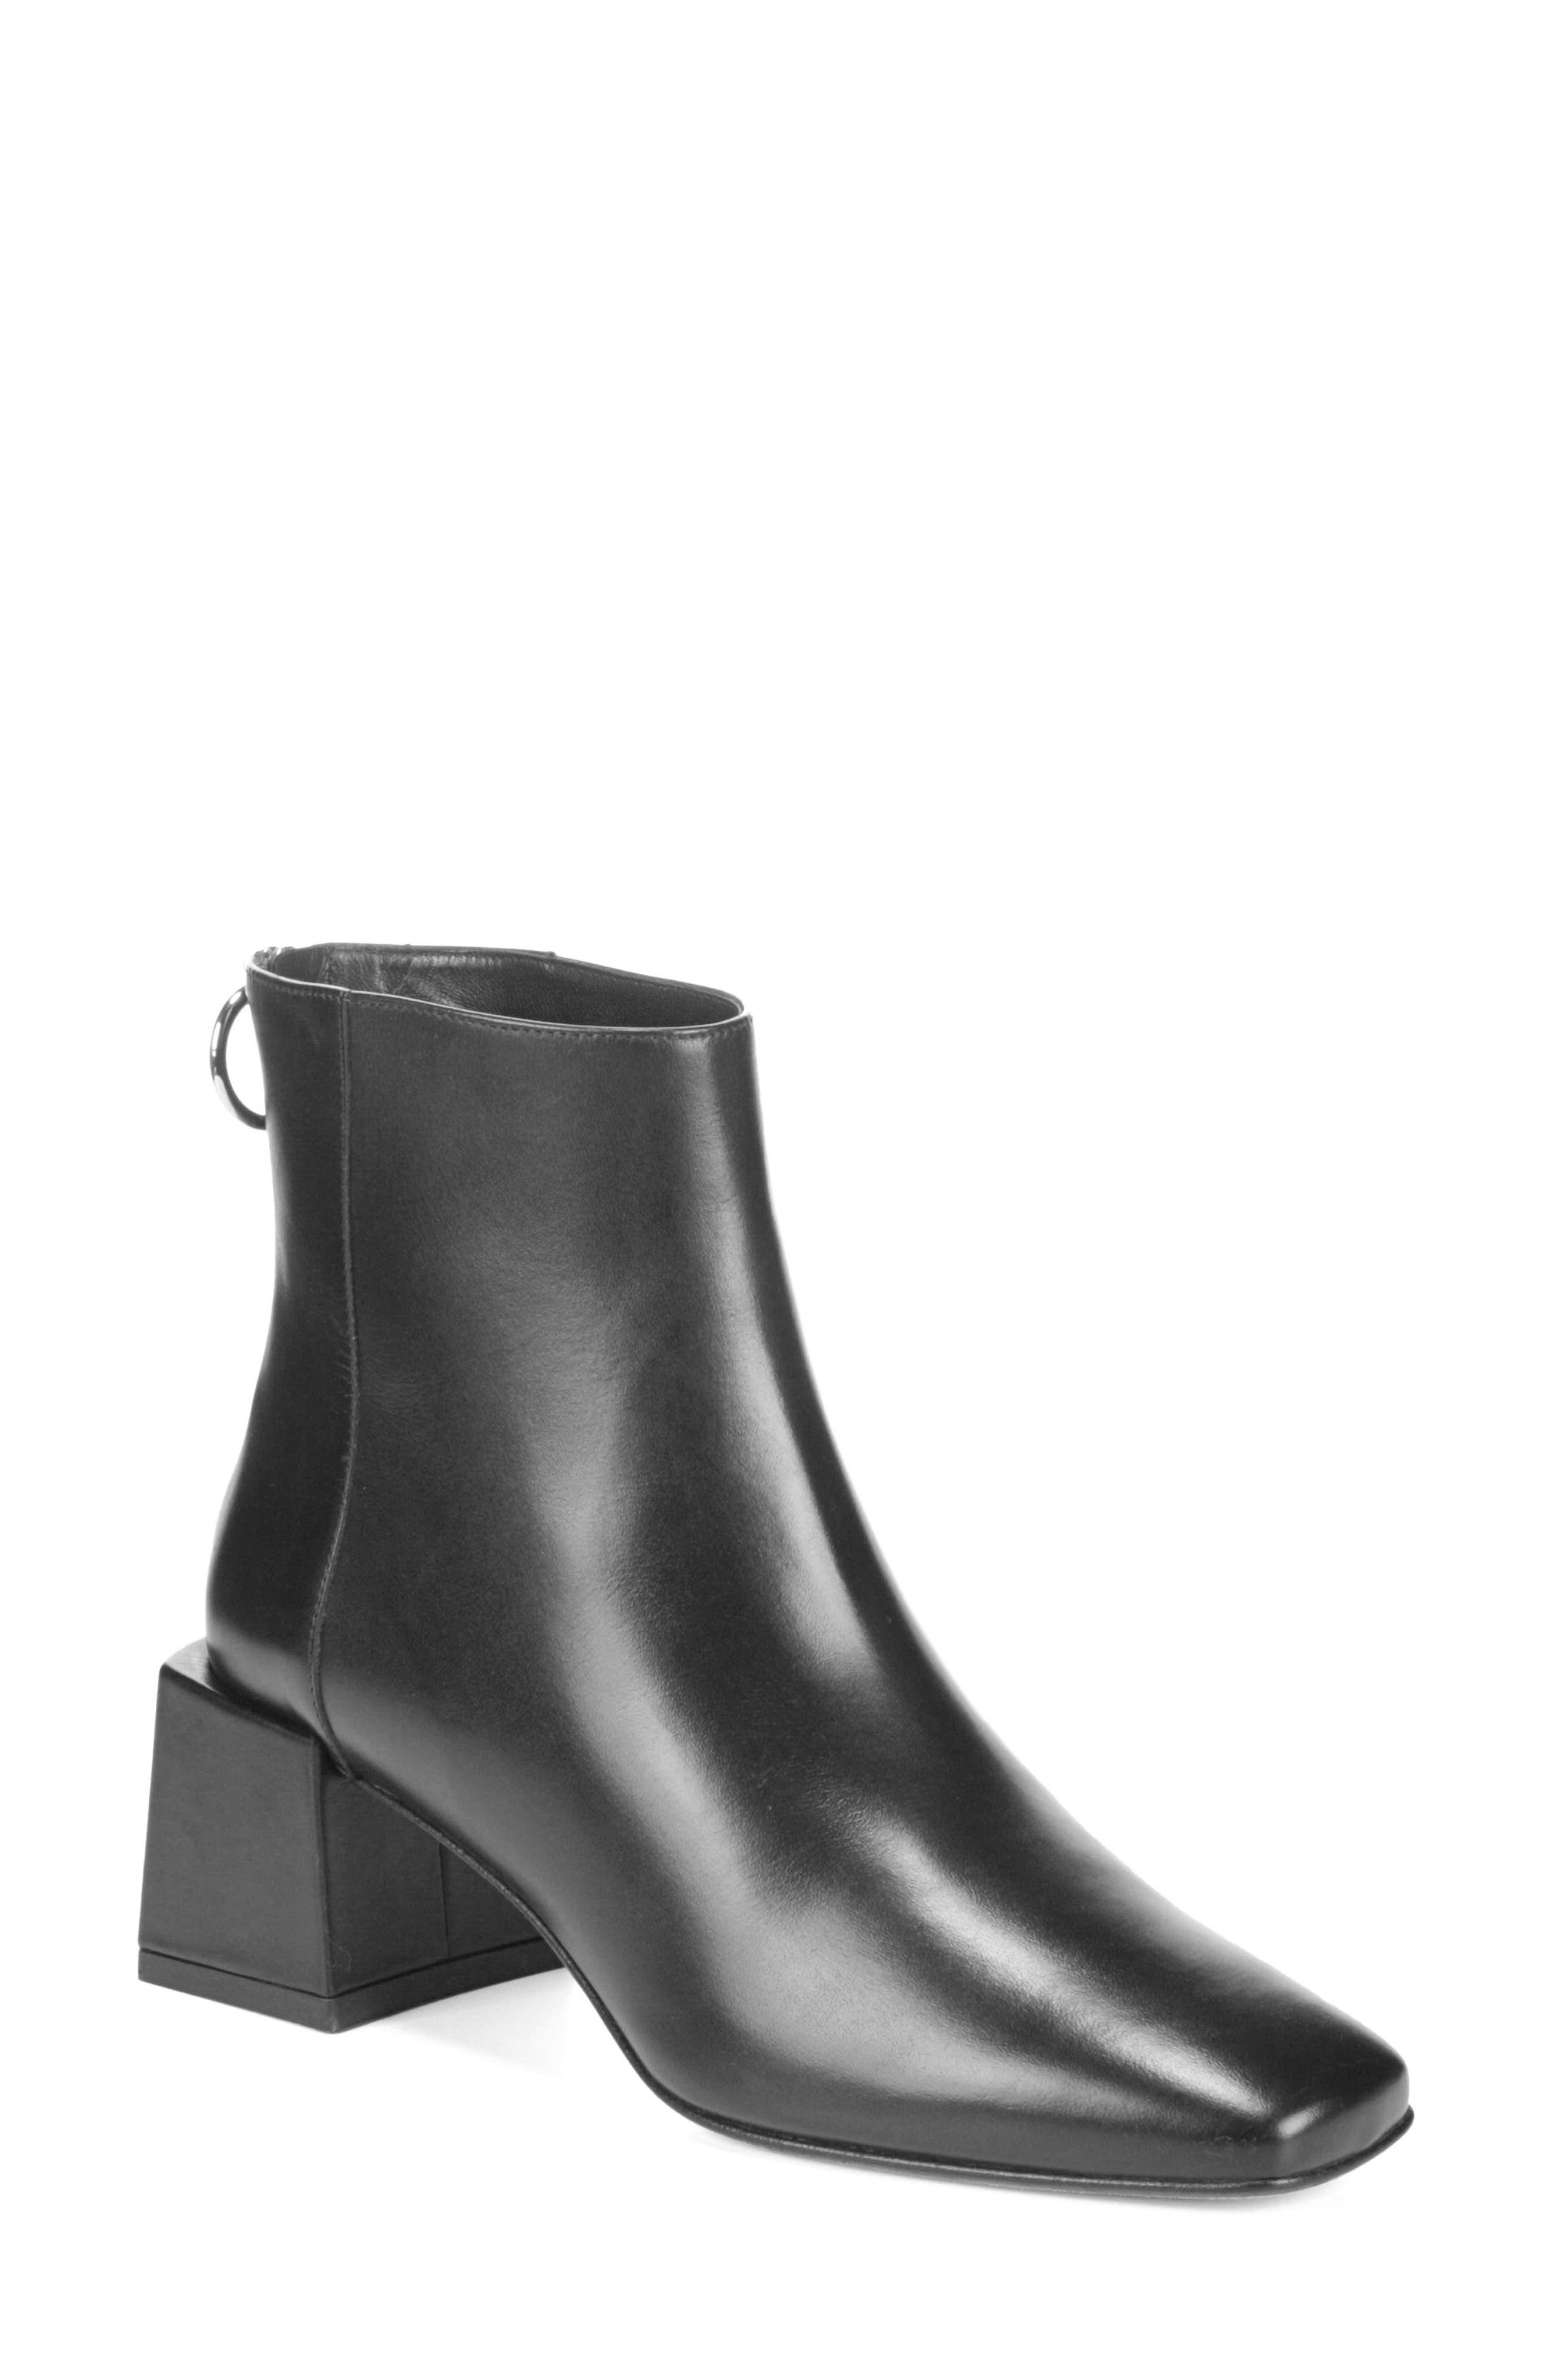 Lara Block Heel Bootie,                         Main,                         color, Black Leather